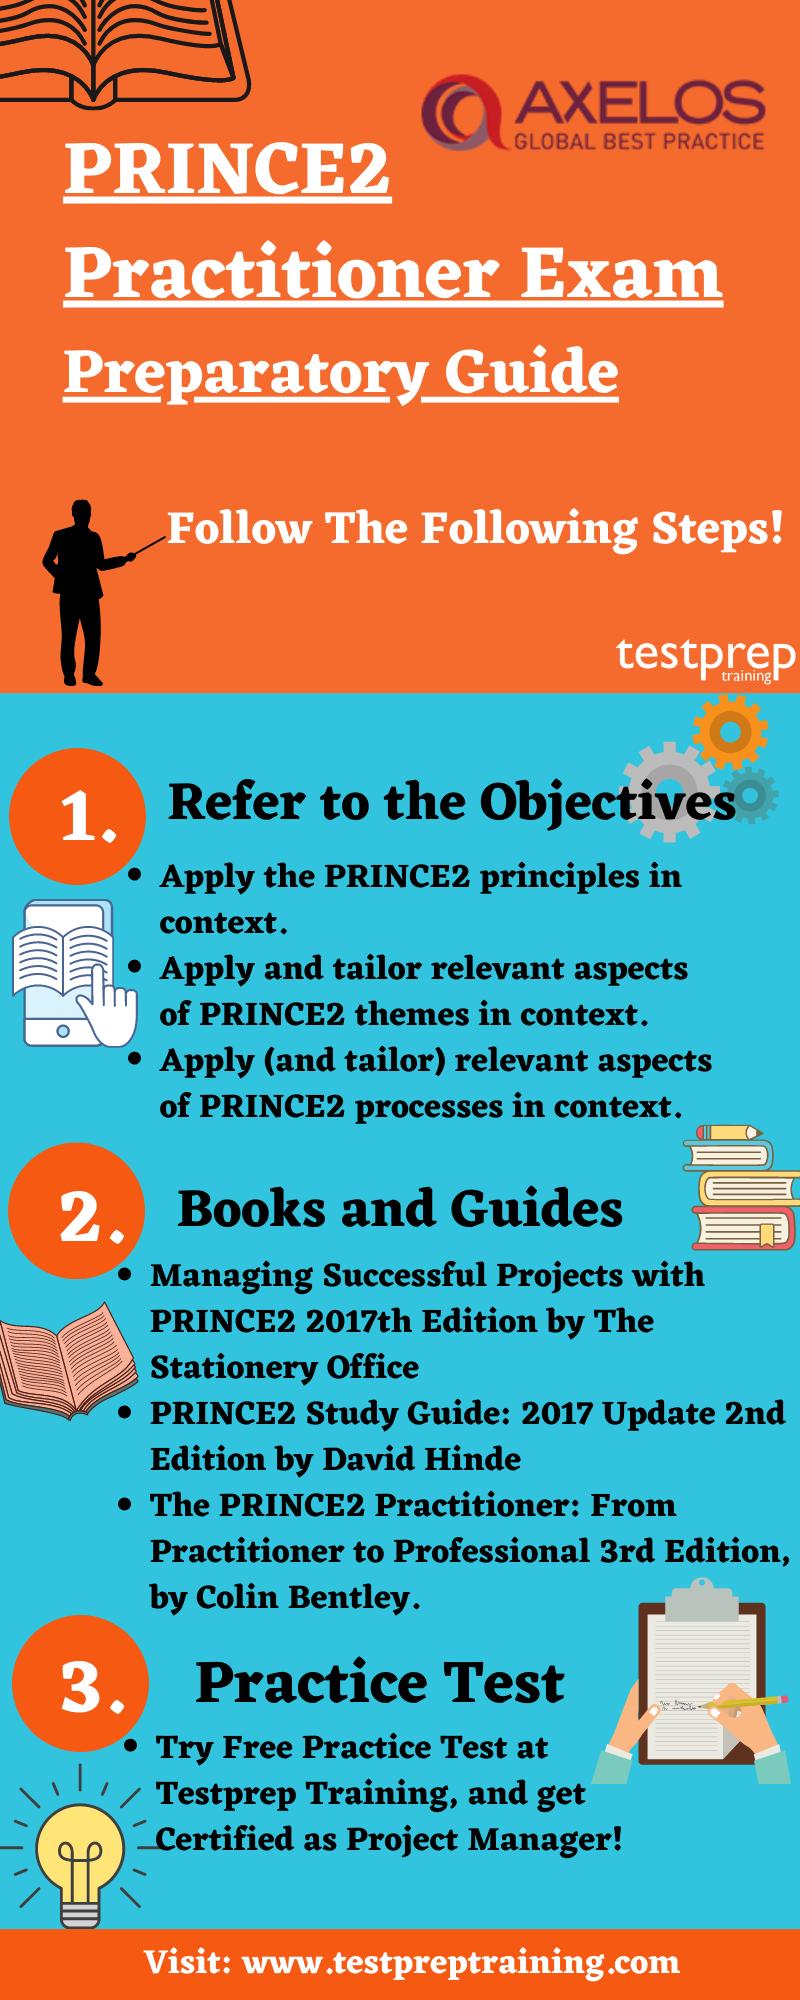 PRINCE2 Practitioner preparatory guide